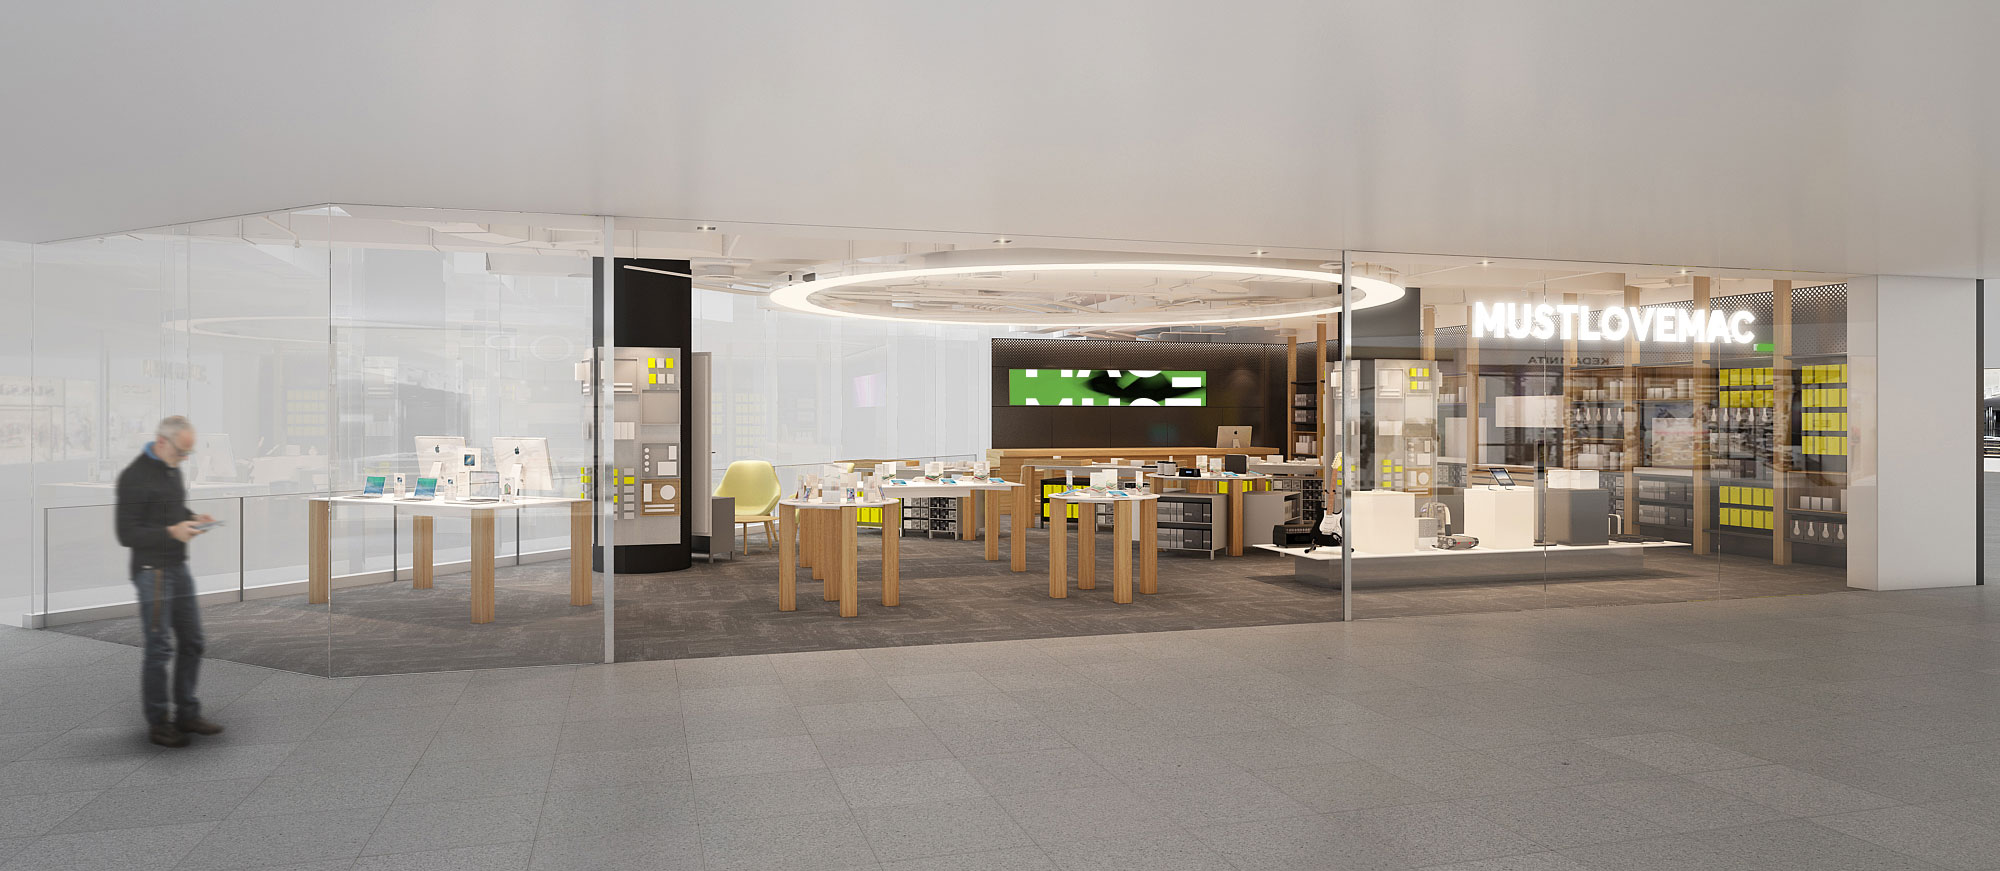 MLM-Shop